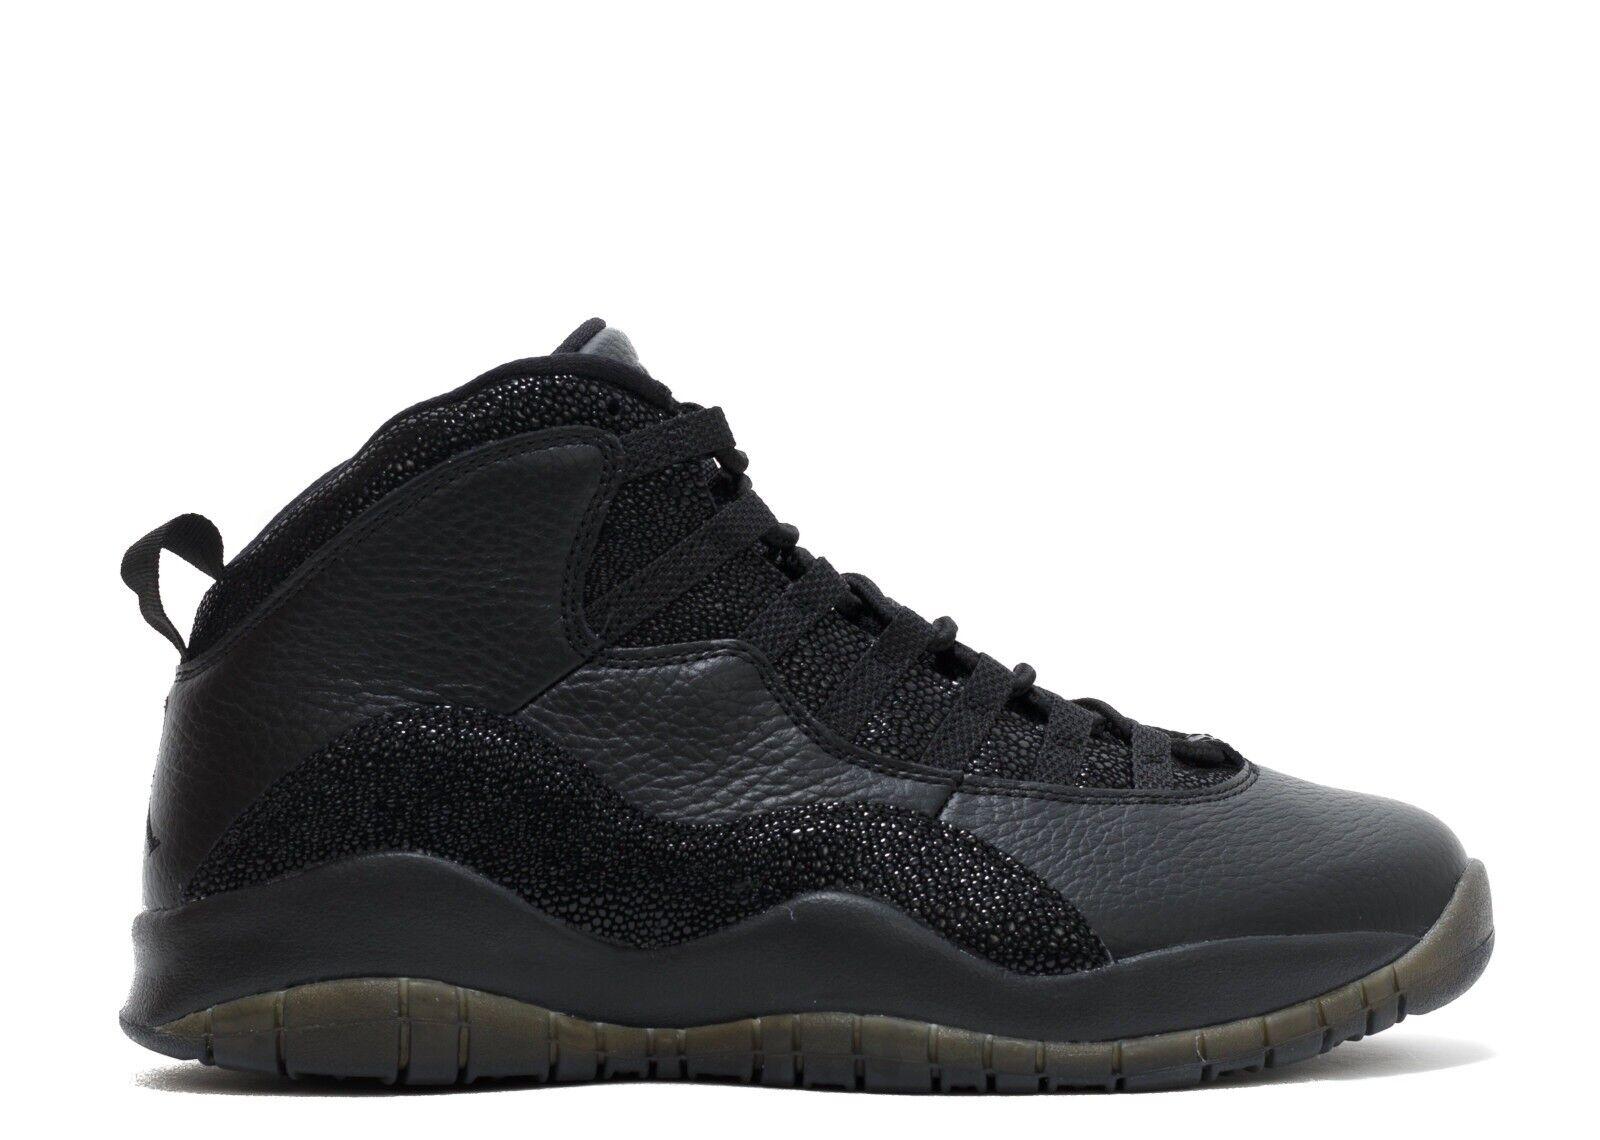 Jordan Retro 10  OVO  Negro X oro  Drake  usado una vez.